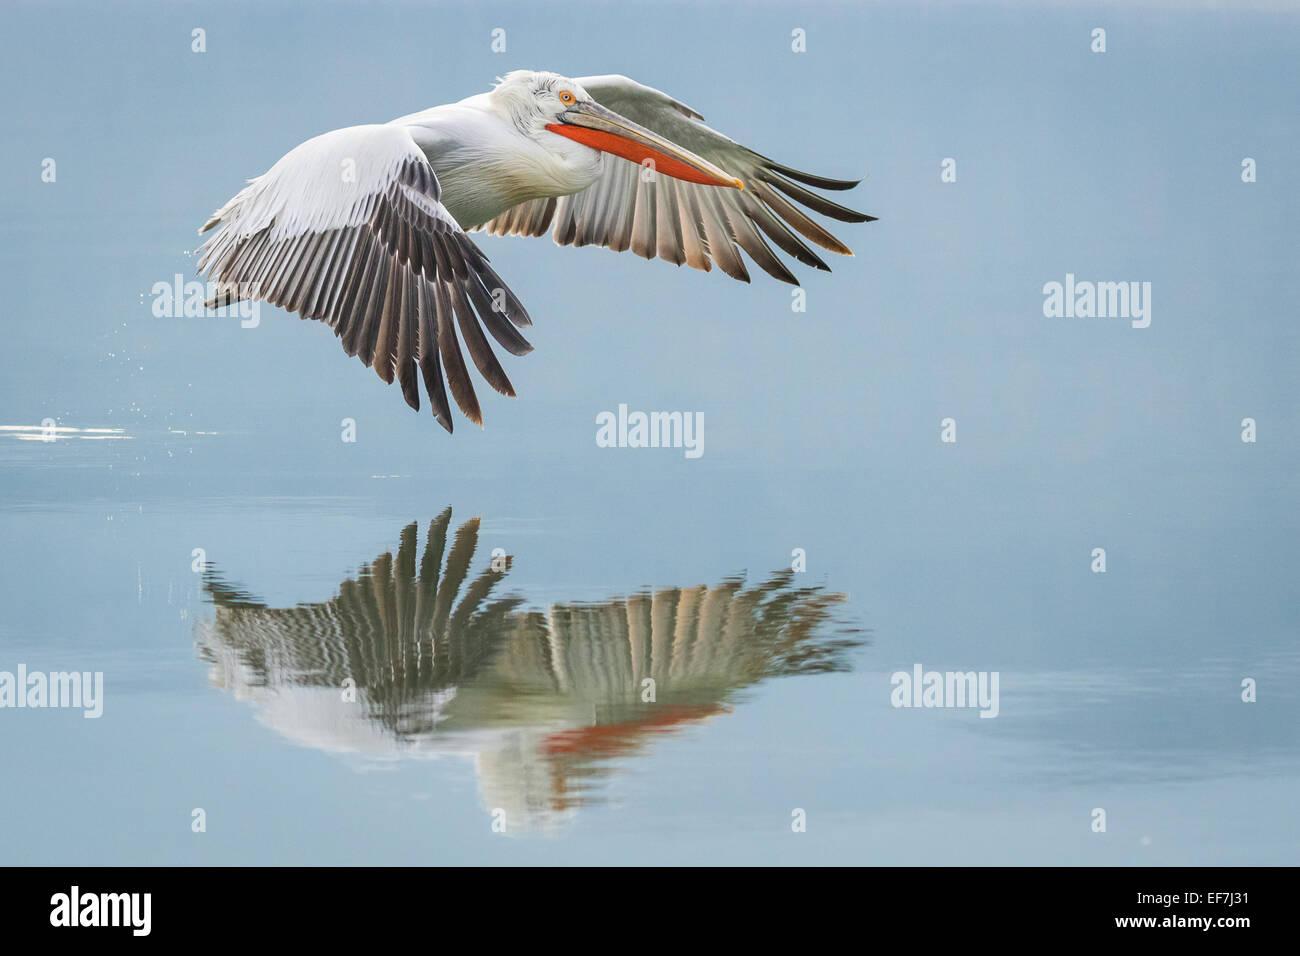 Dalmatian Pelican (Pelecanus crispus) flies across a near still Lake Kerkini in Northern Greece, its reflection - Stock Image